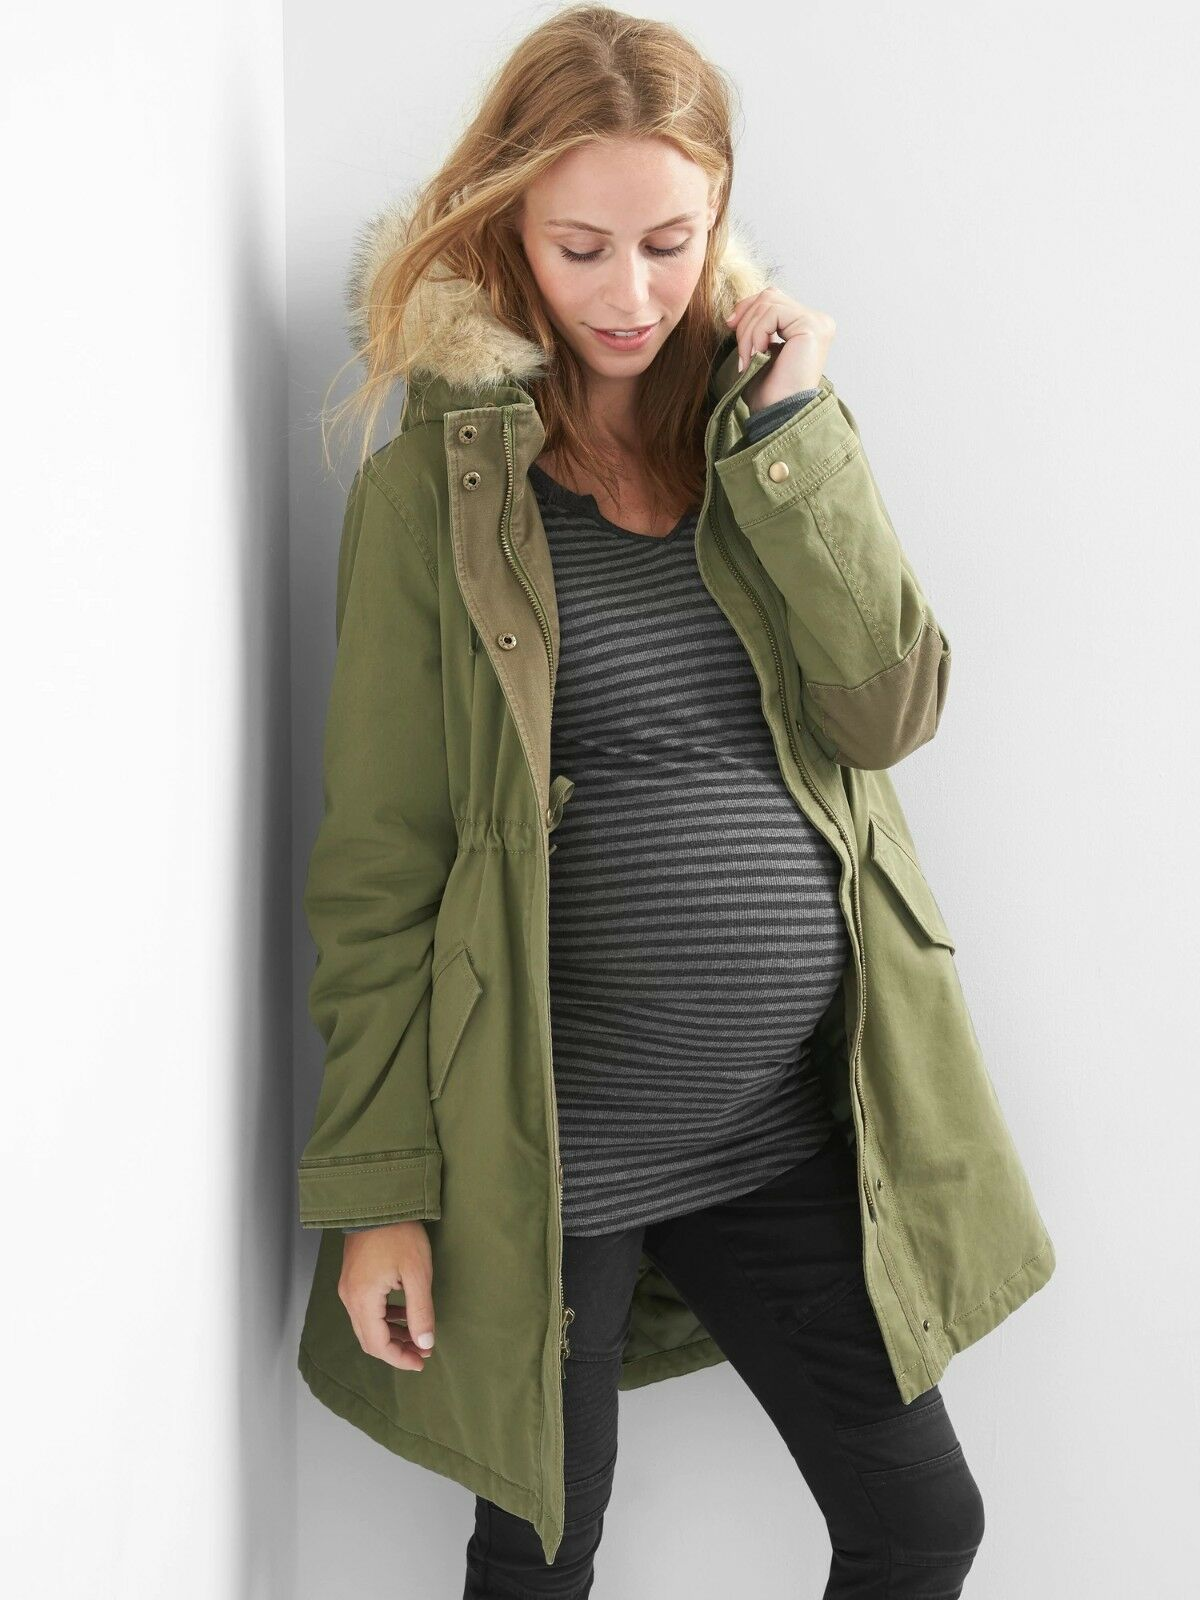 NWT Gap Maternity PrimaLoft parka Coat, Olive SIZE XL               E918